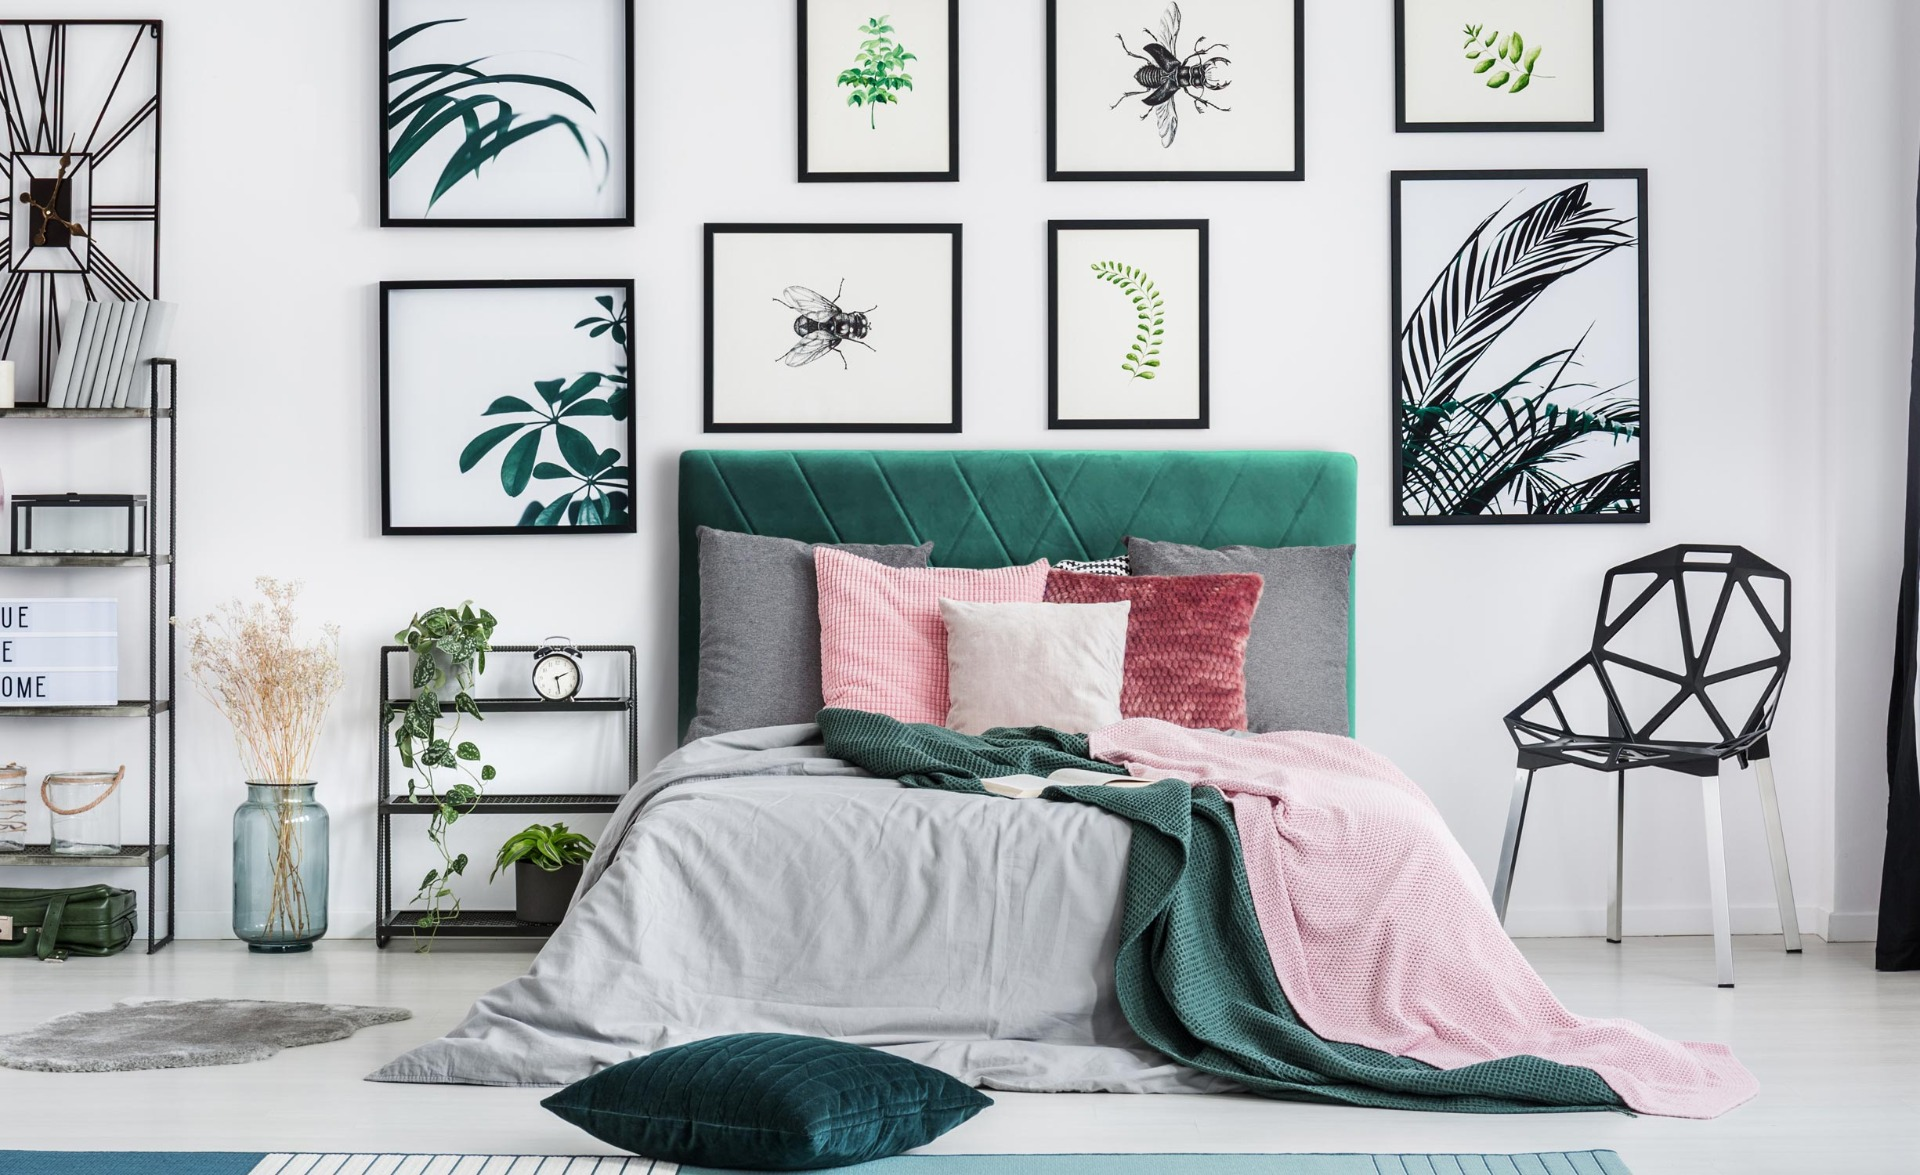 Tête de lit Diam 160cm Velours Vert